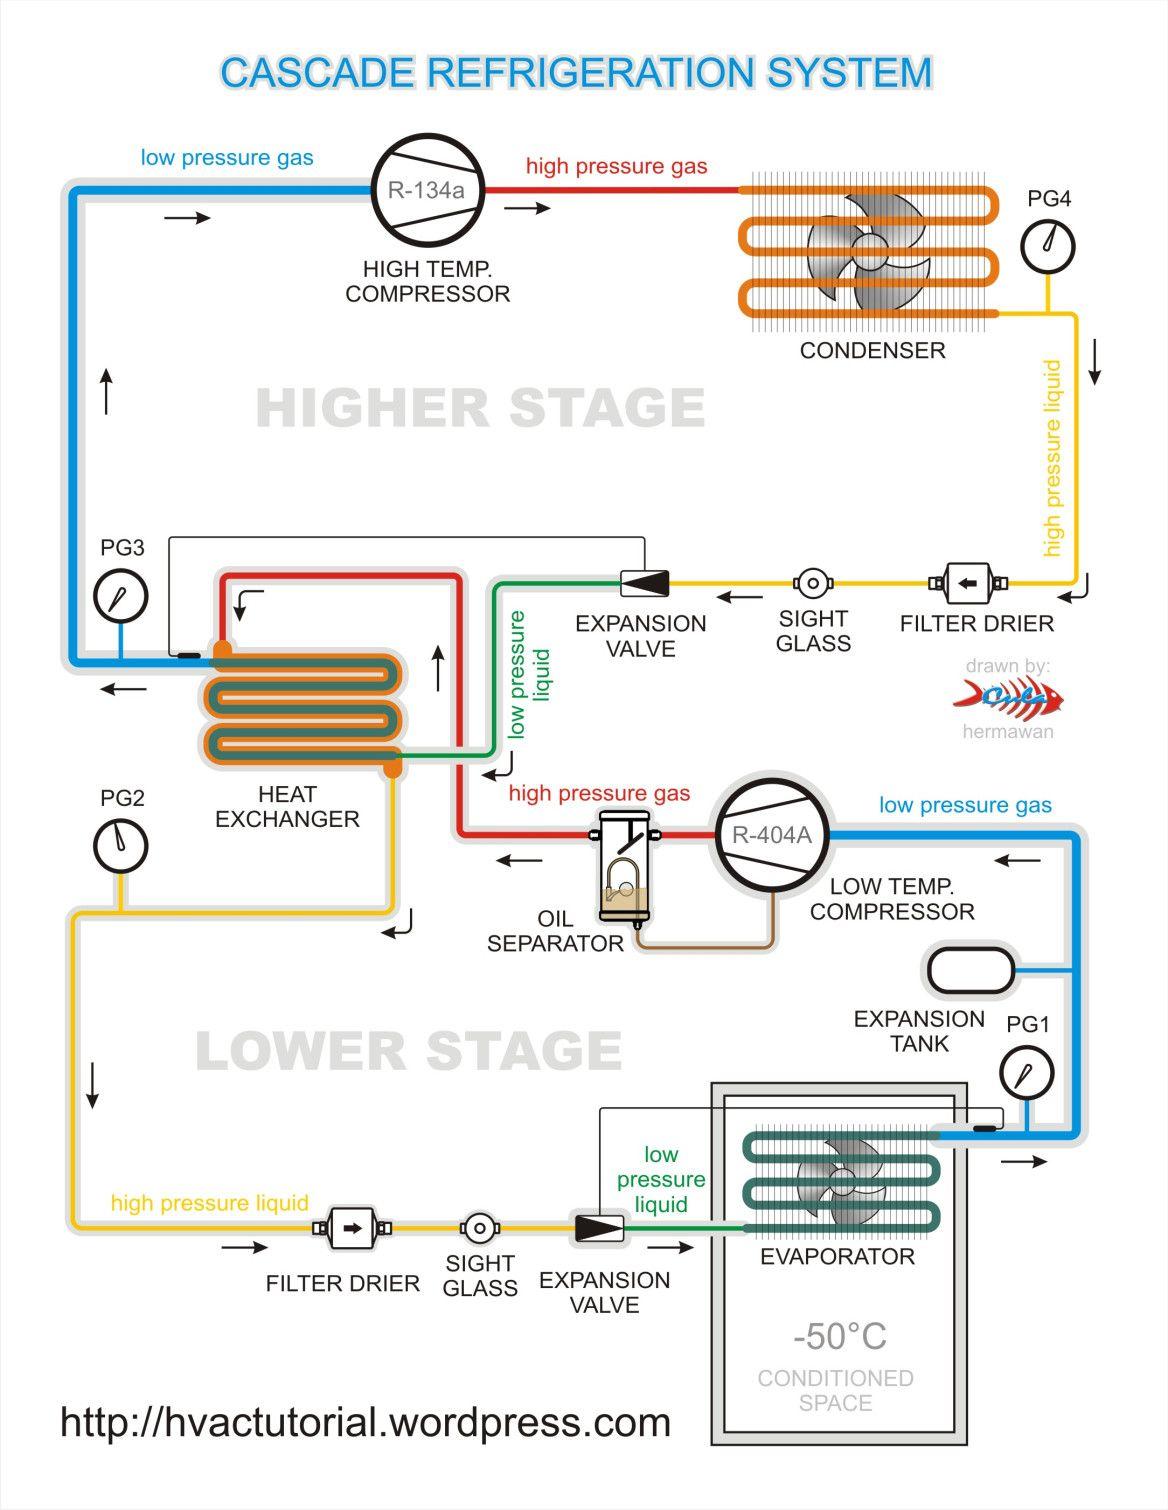 Cascade Refrigeration System in 2020 Refrigeration and